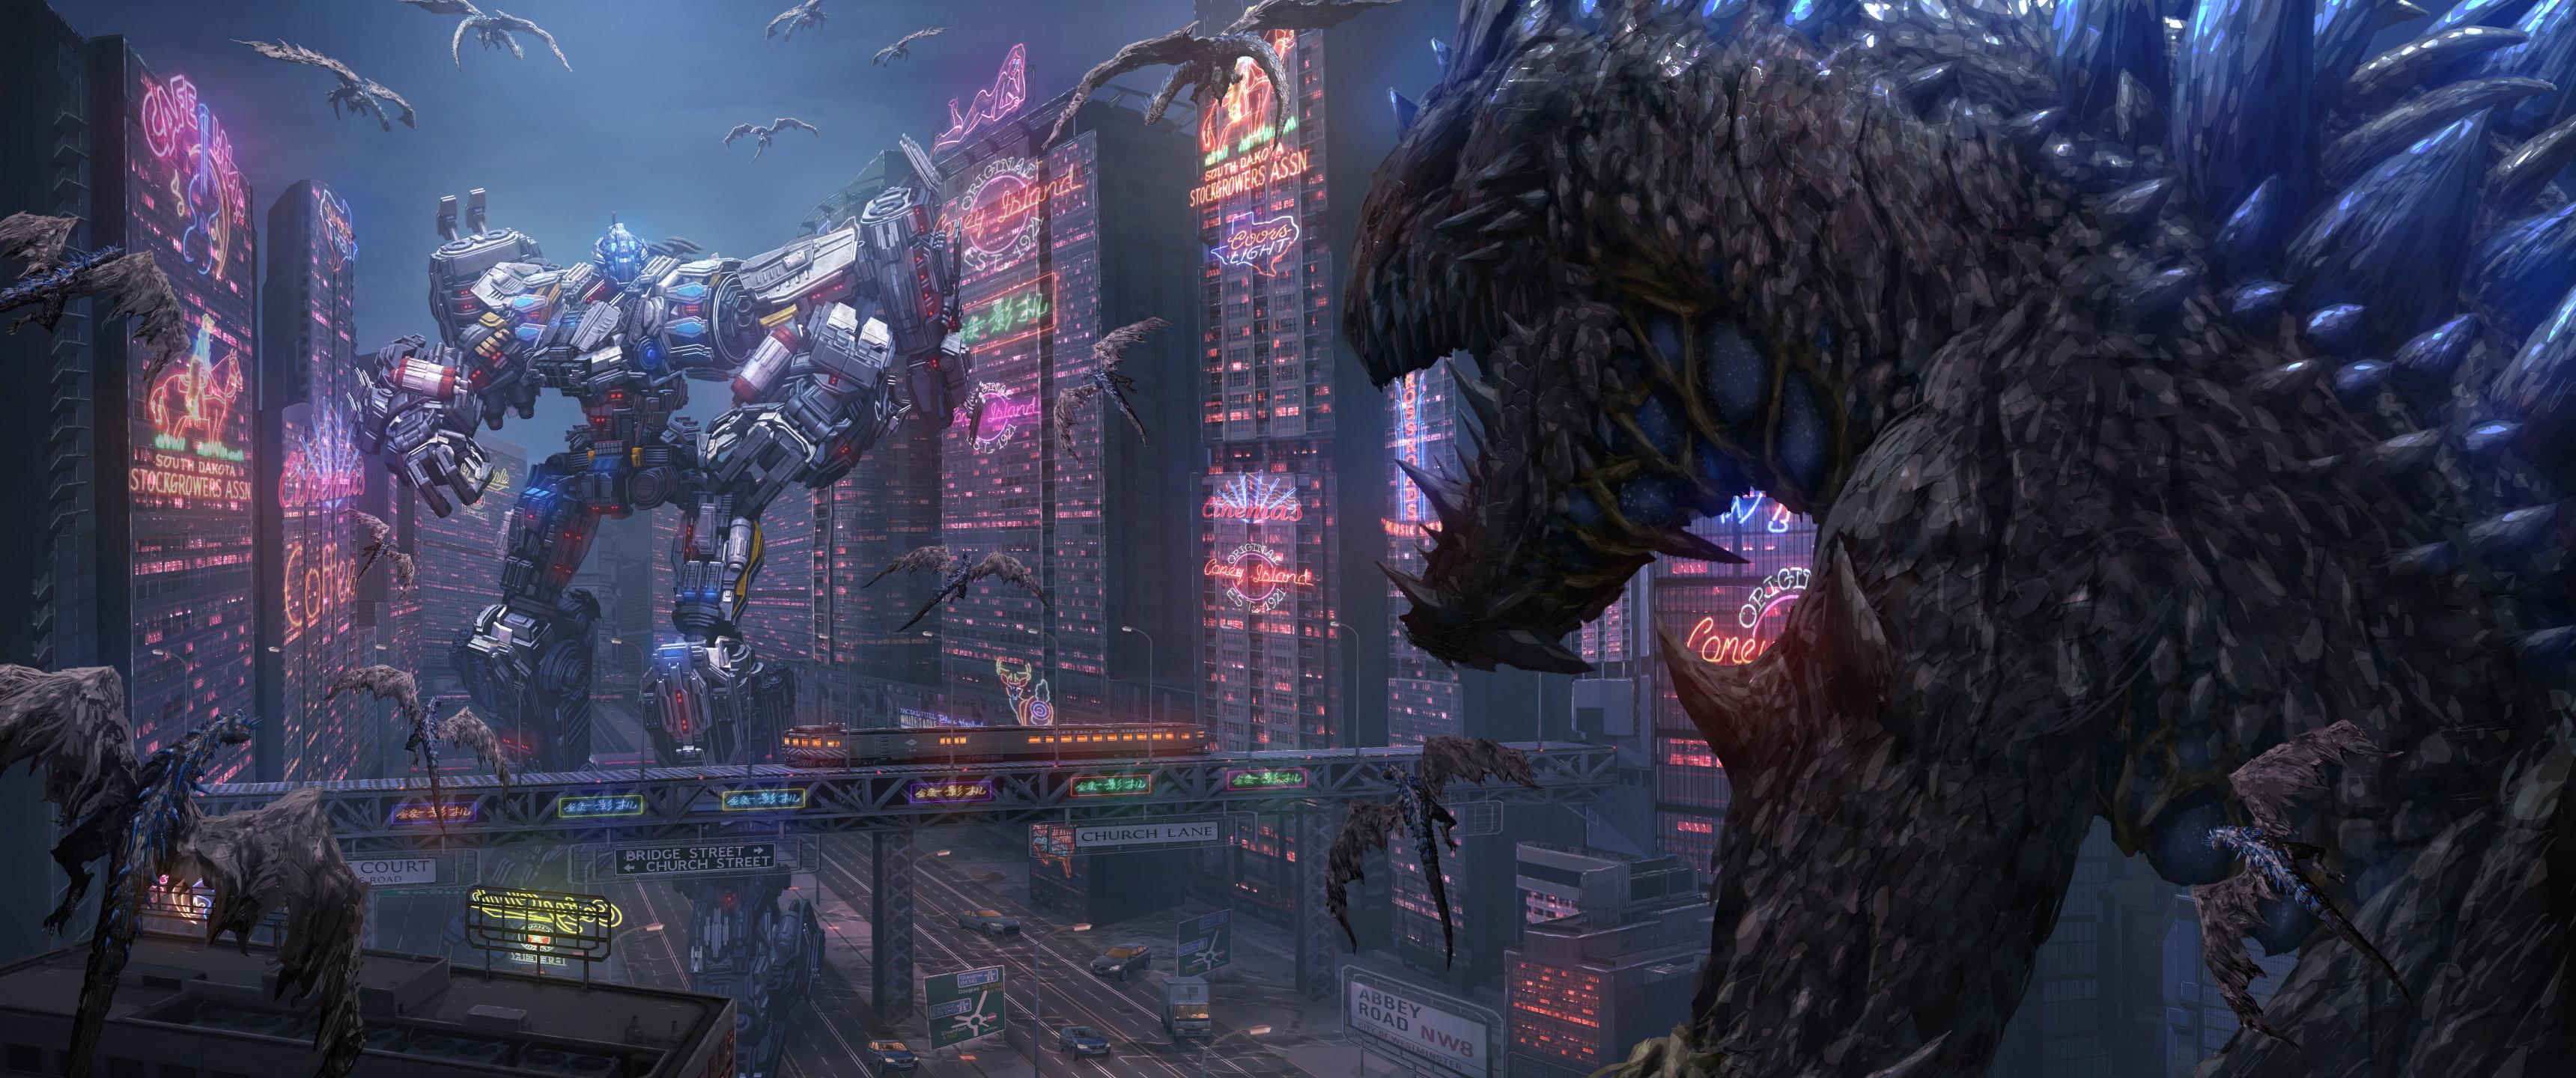 Alien, Dinosaur, T-Rex, Robot, Building resized by Ze Robot